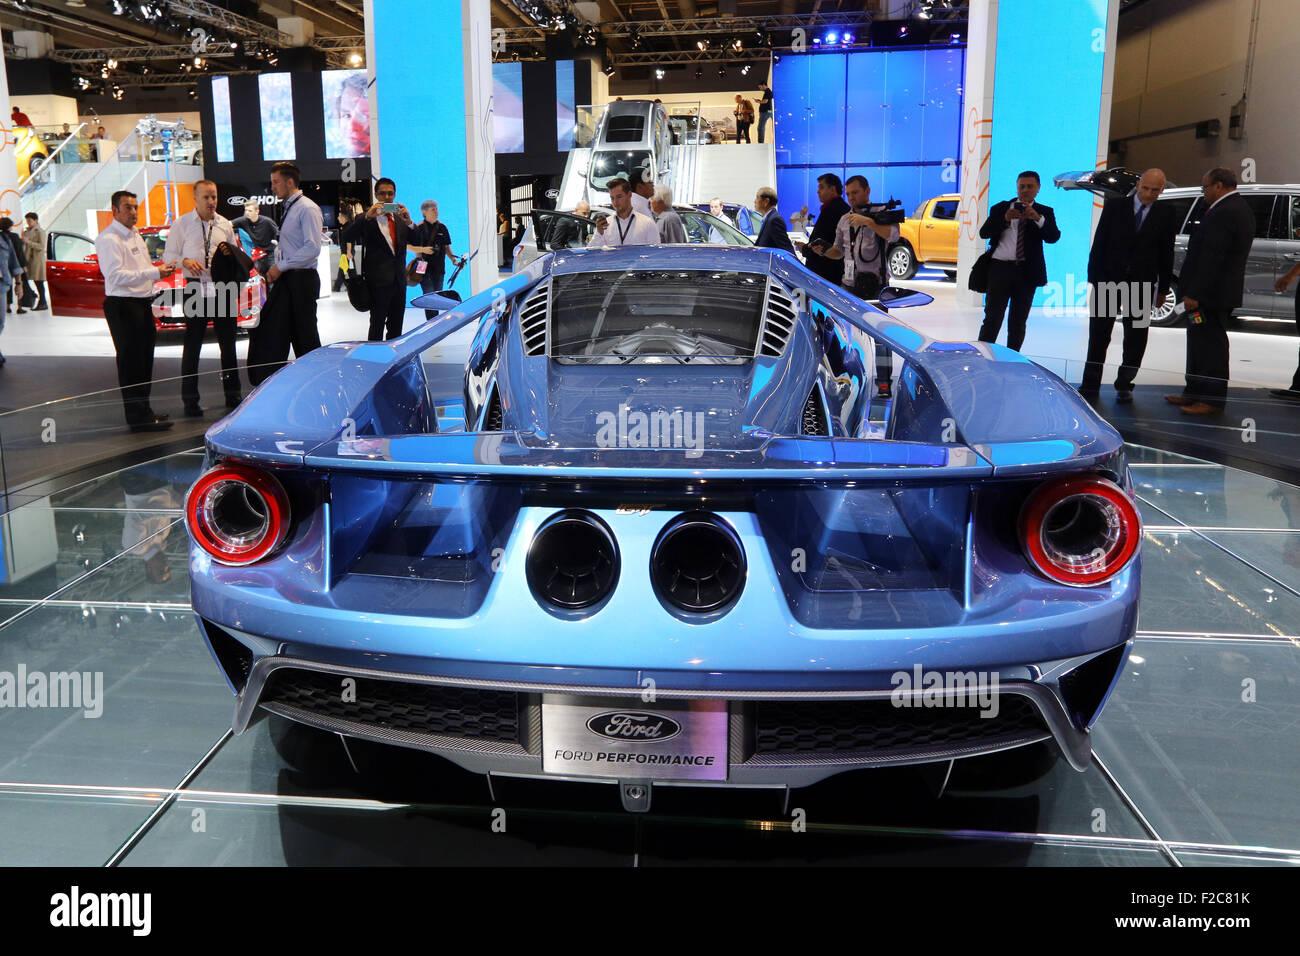 Frankfurt/M, 16.09.2015 - Ford GT concept car al Ford stand presso il 66° International Motor Show IAA 2015 Immagini Stock